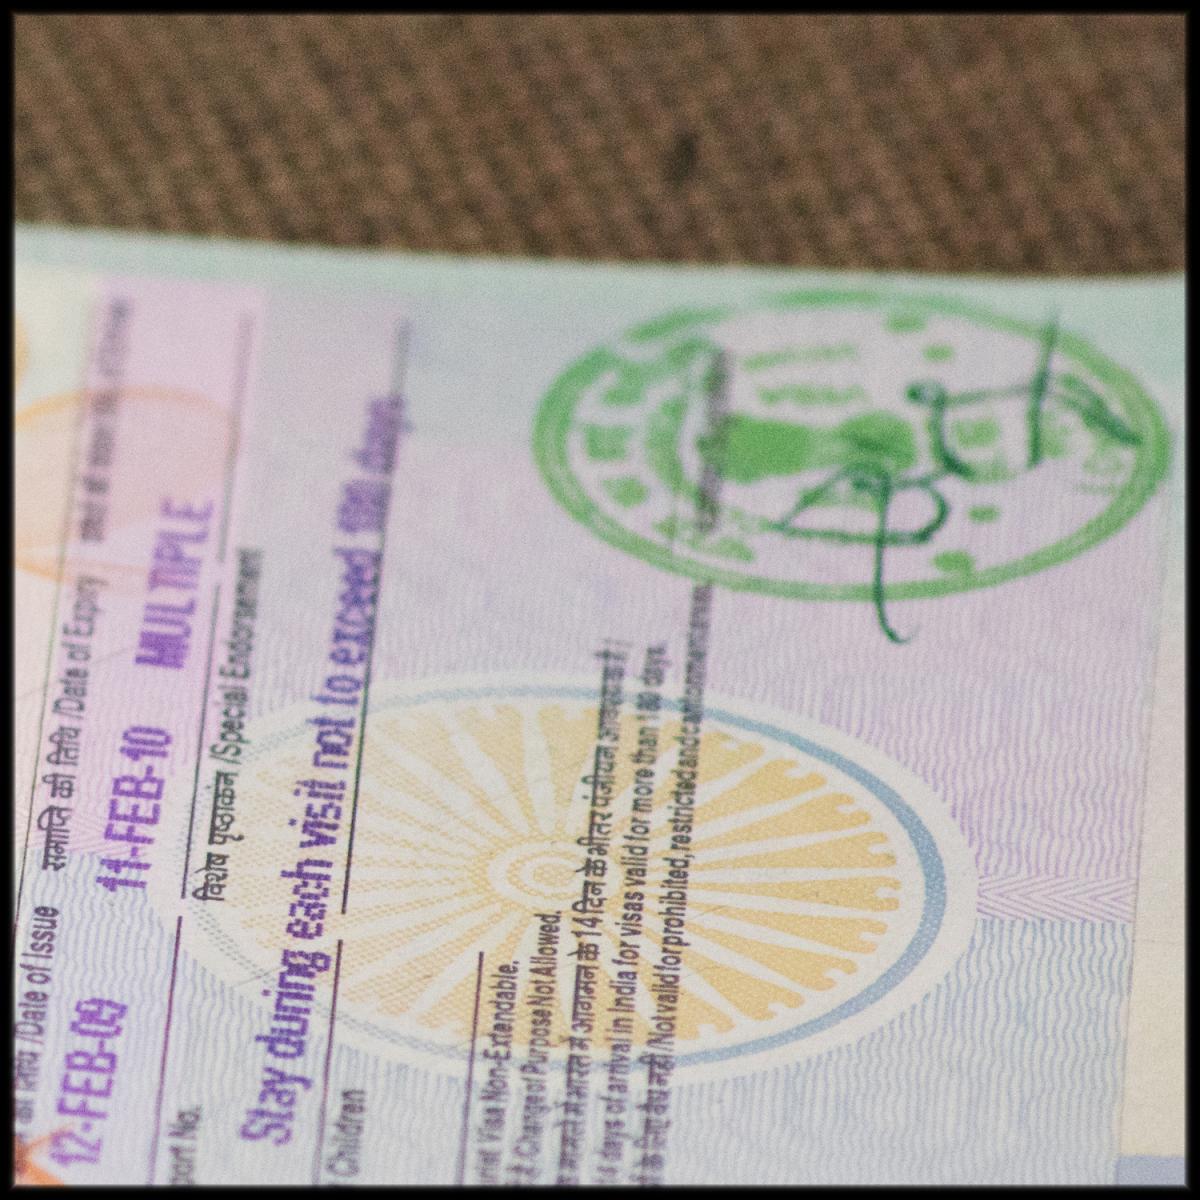 Travel-permit-Sandra-Sergeant-Photography-Basingstoke-Passport-Photographs